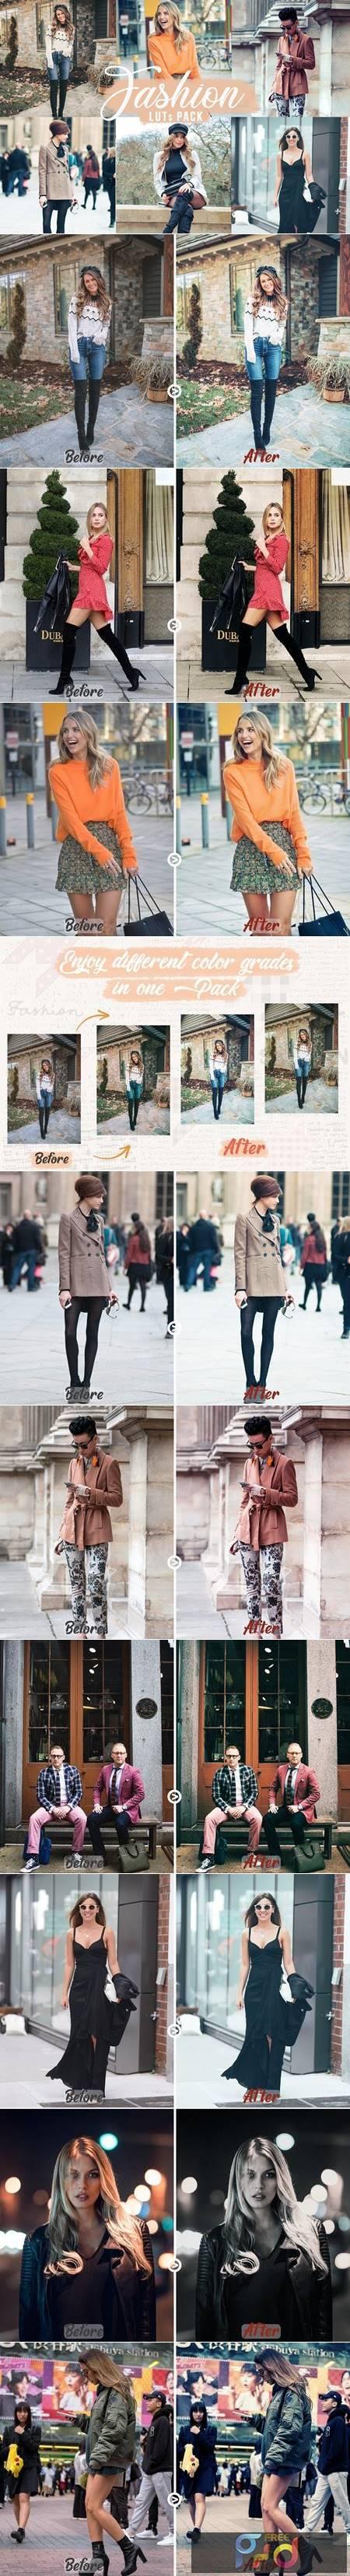 Fashion LUTs - Fashion Video filters 5749768 1